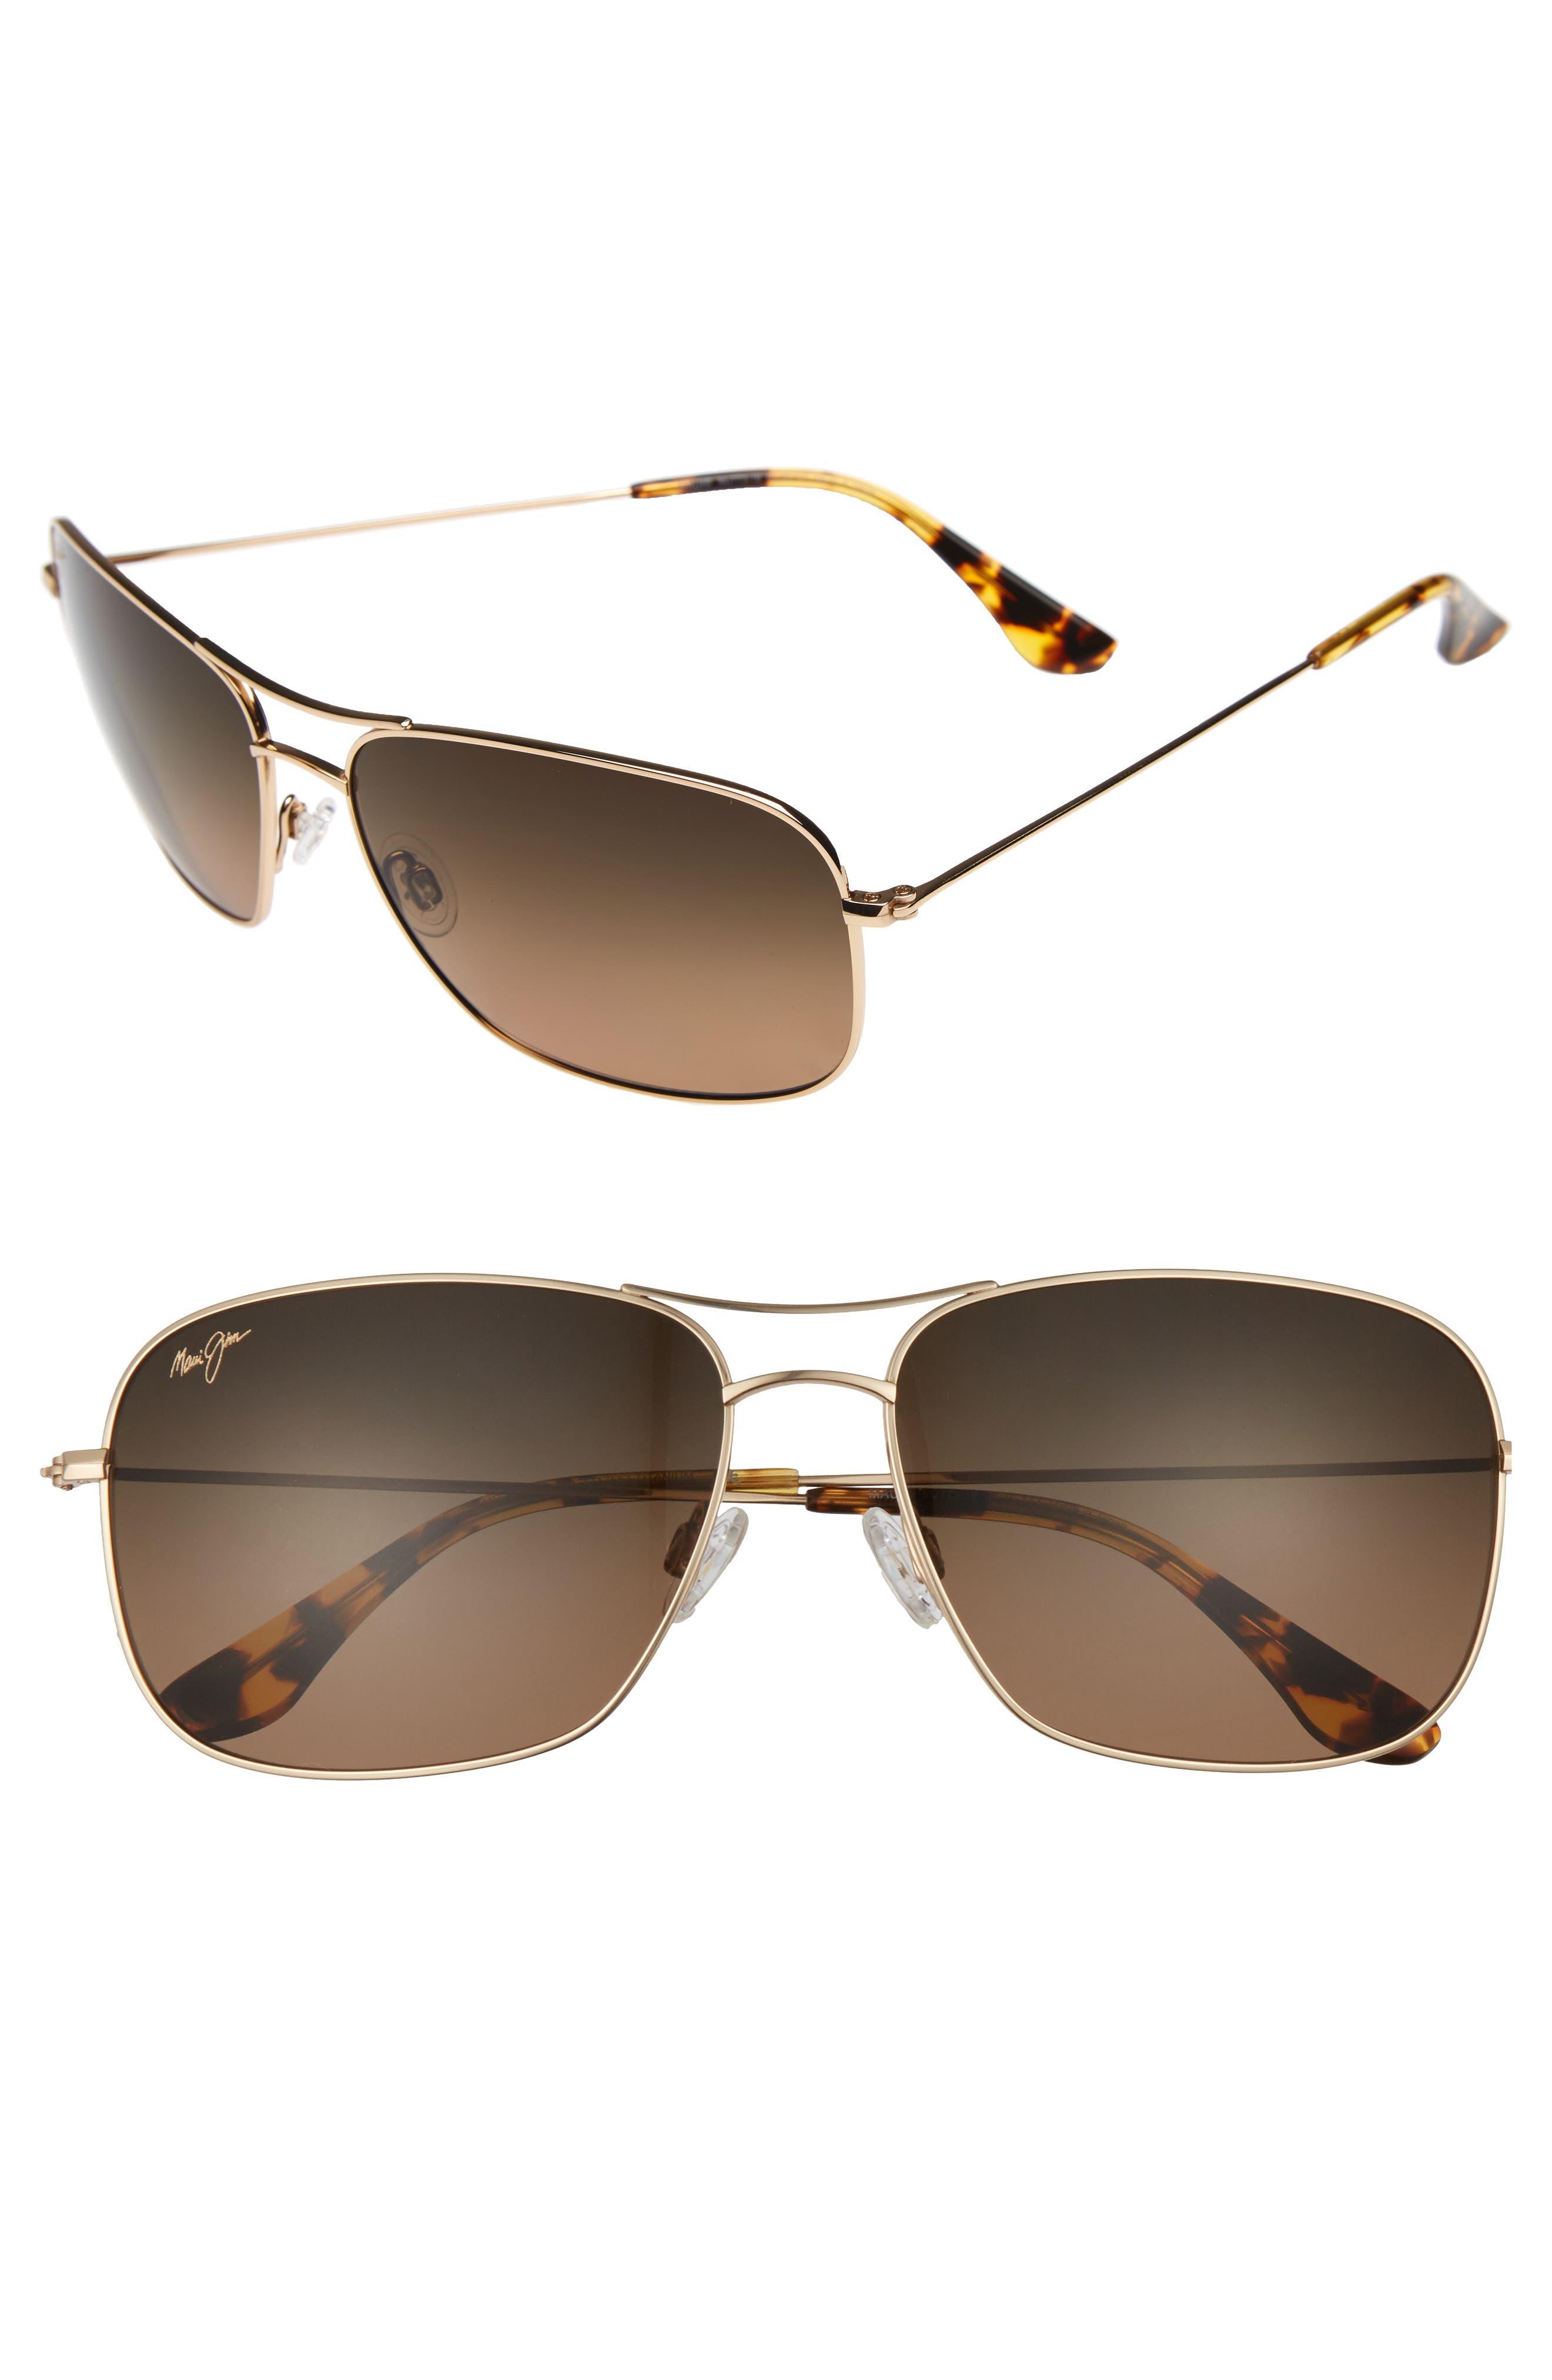 Main Image - Maui Jim Breezeway 63mm PolarizedPlus2® Sunglasses